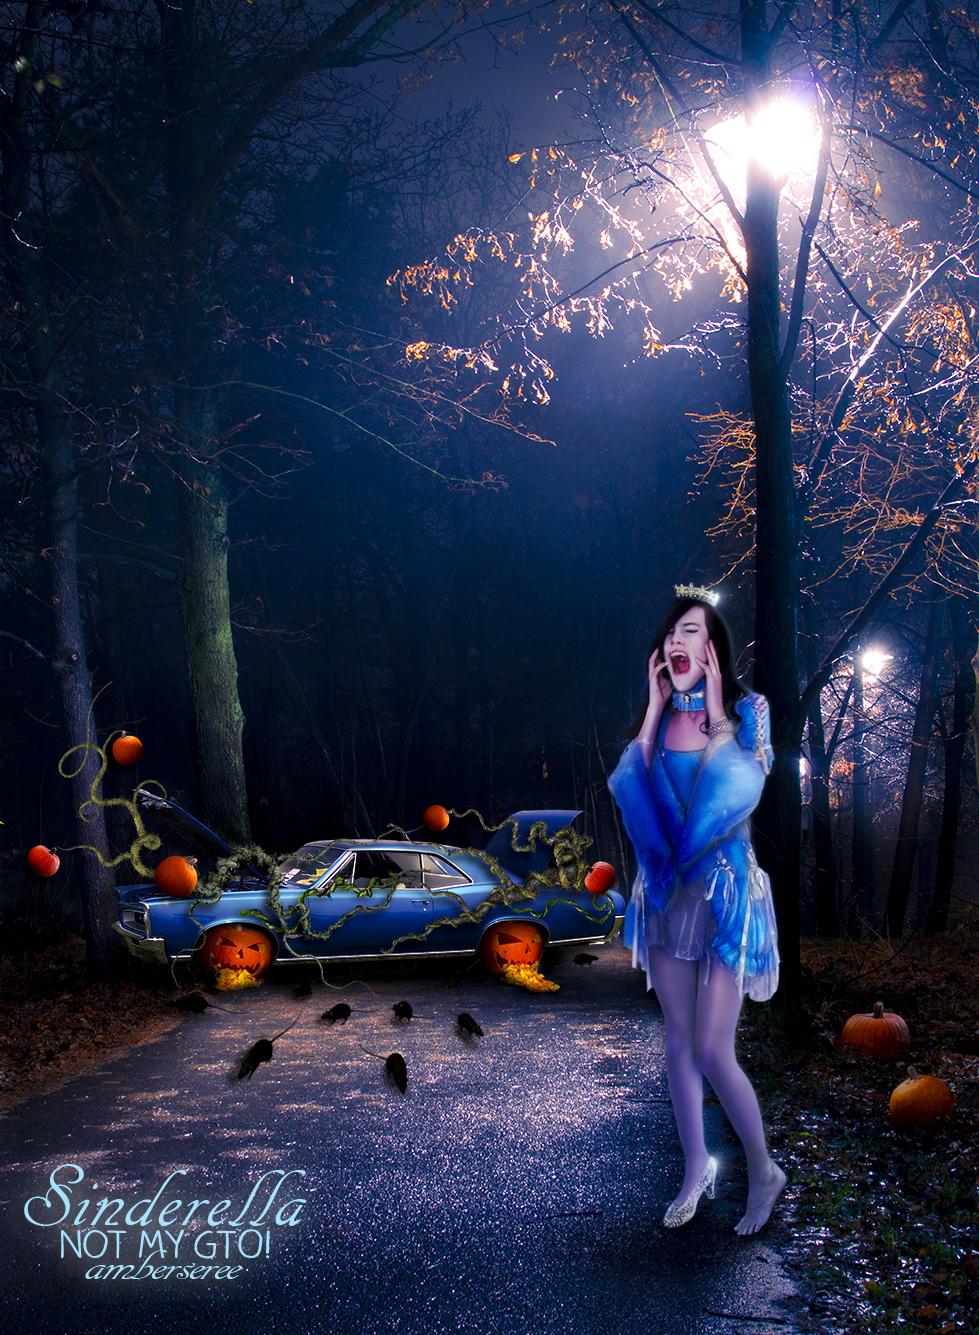 Sinderella - Not My GTO!!!!! by AmberSeree